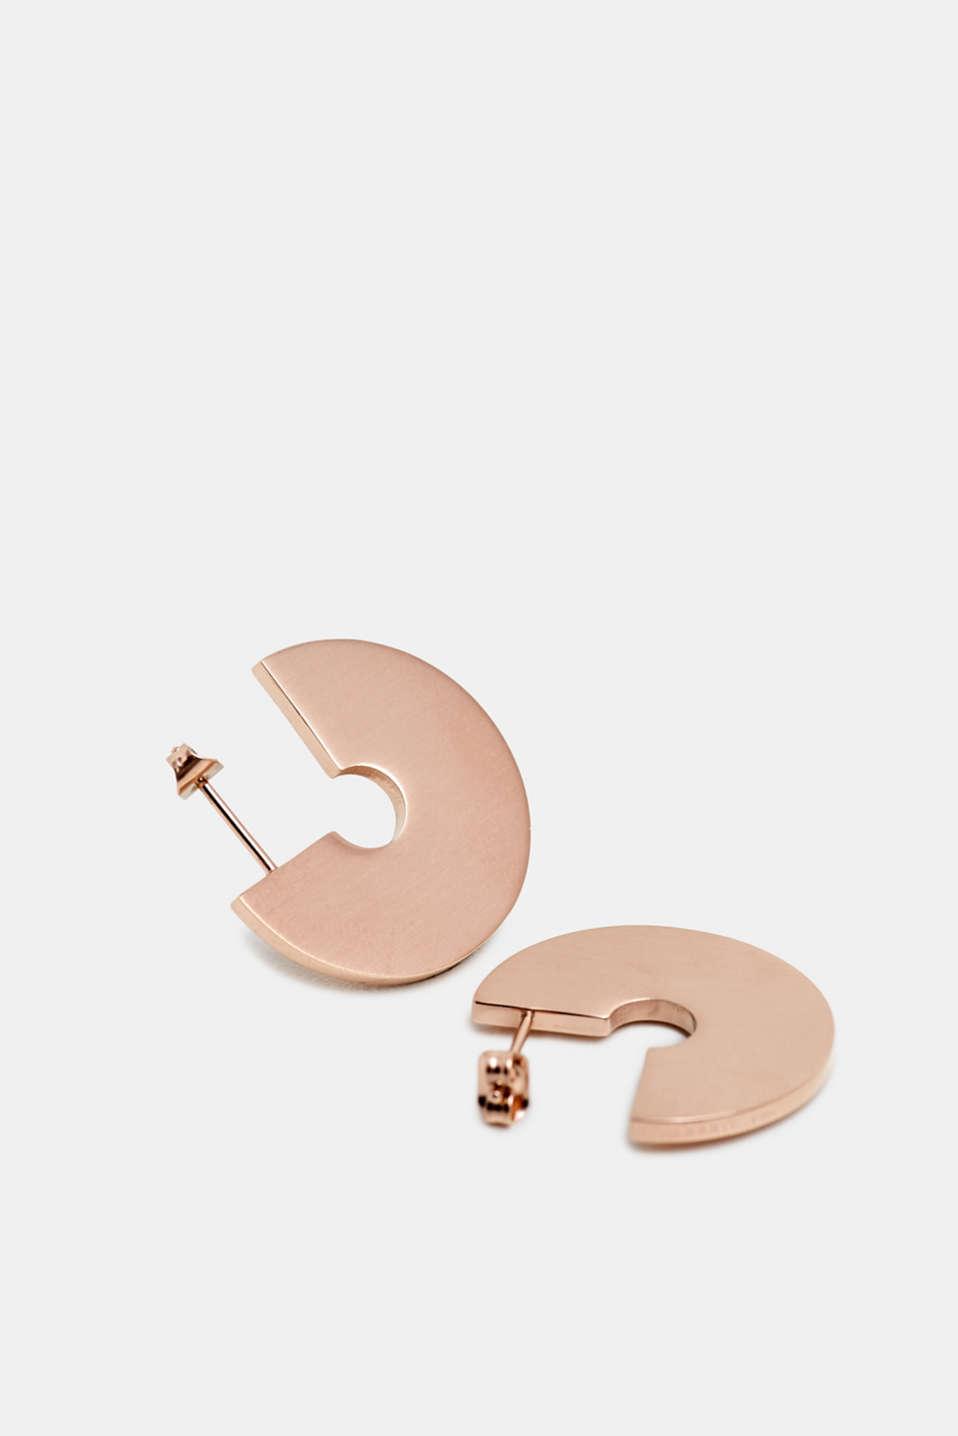 Stainless steel earrings, ROSEGOLD, detail image number 1